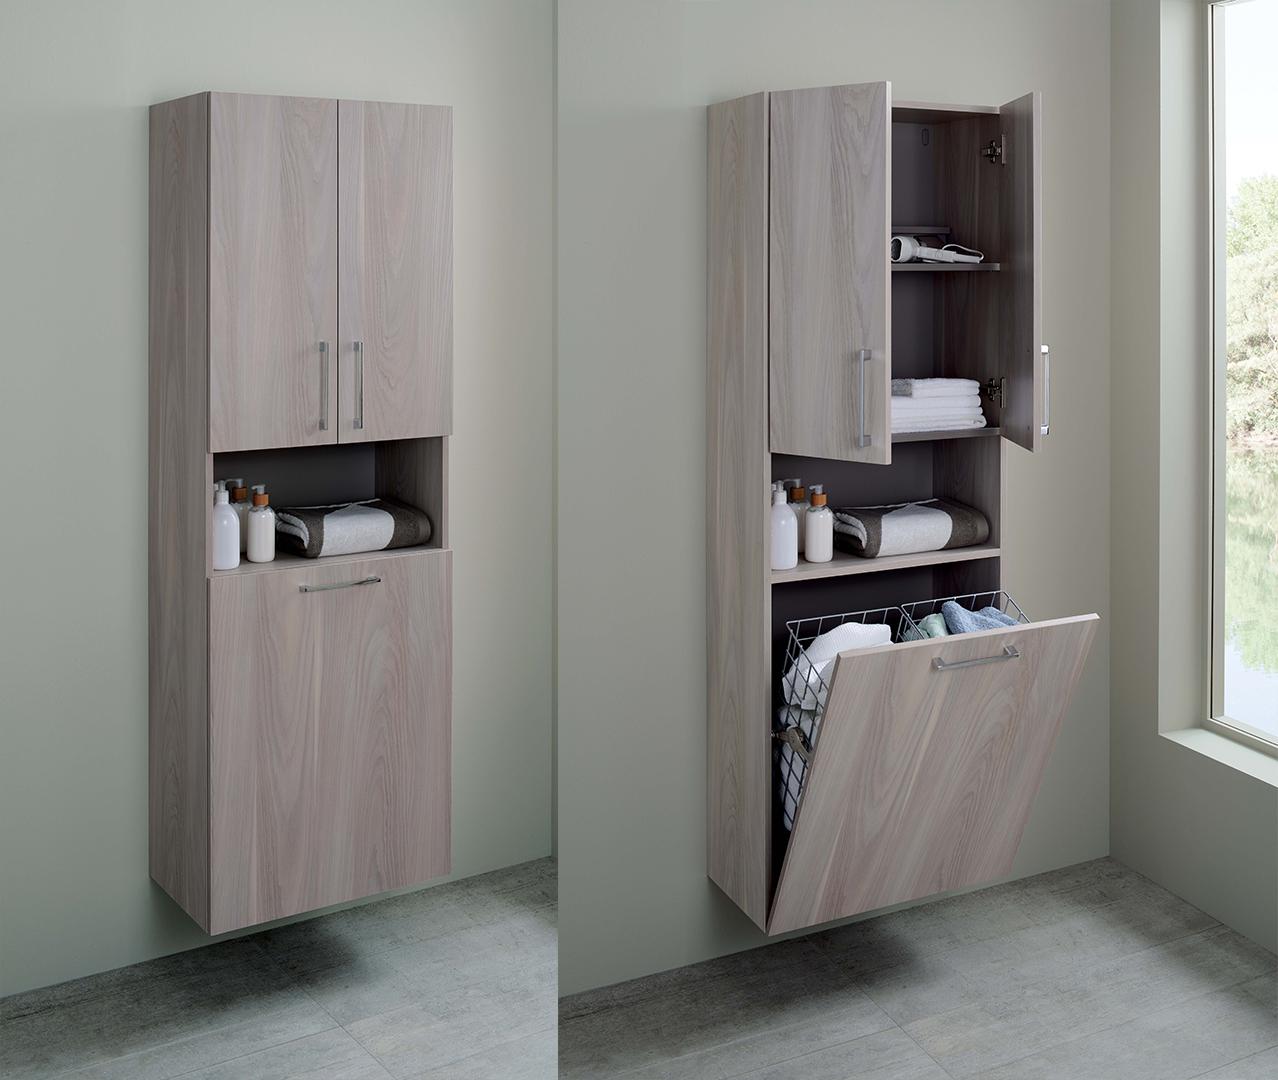 Meuble De Rangement De Salle De Bain gamme elemento, colonne salle de bain, colonne rangement